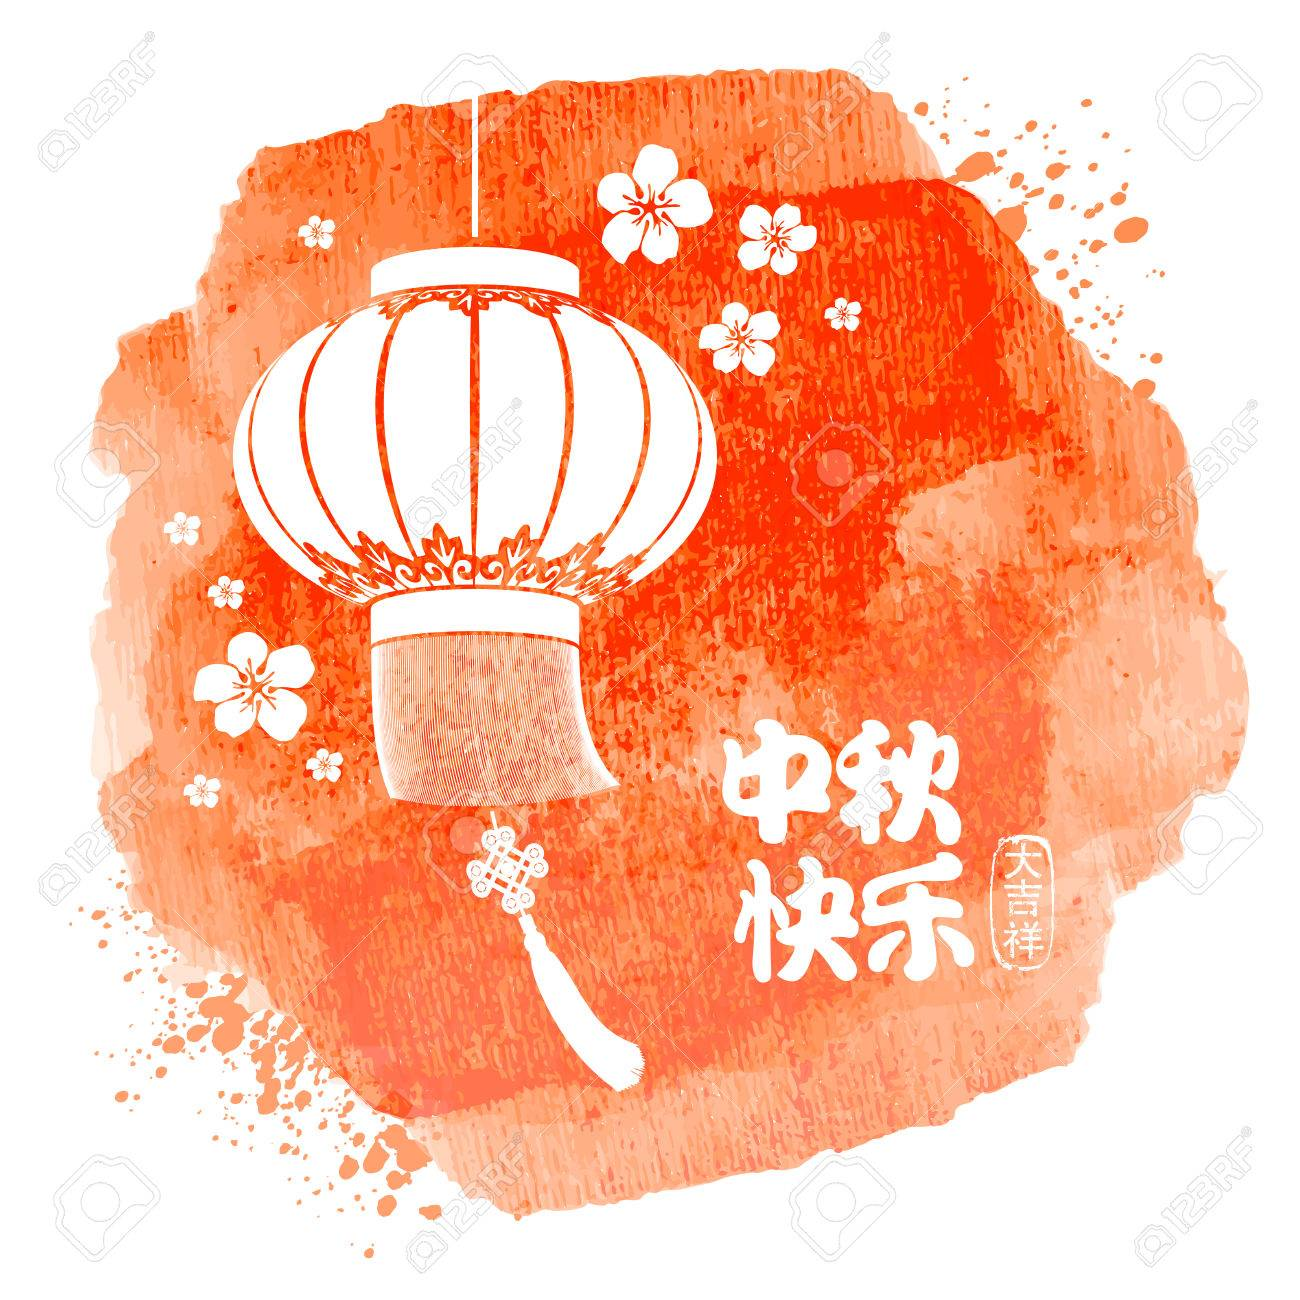 chinese lantern festival design translation chinese characters